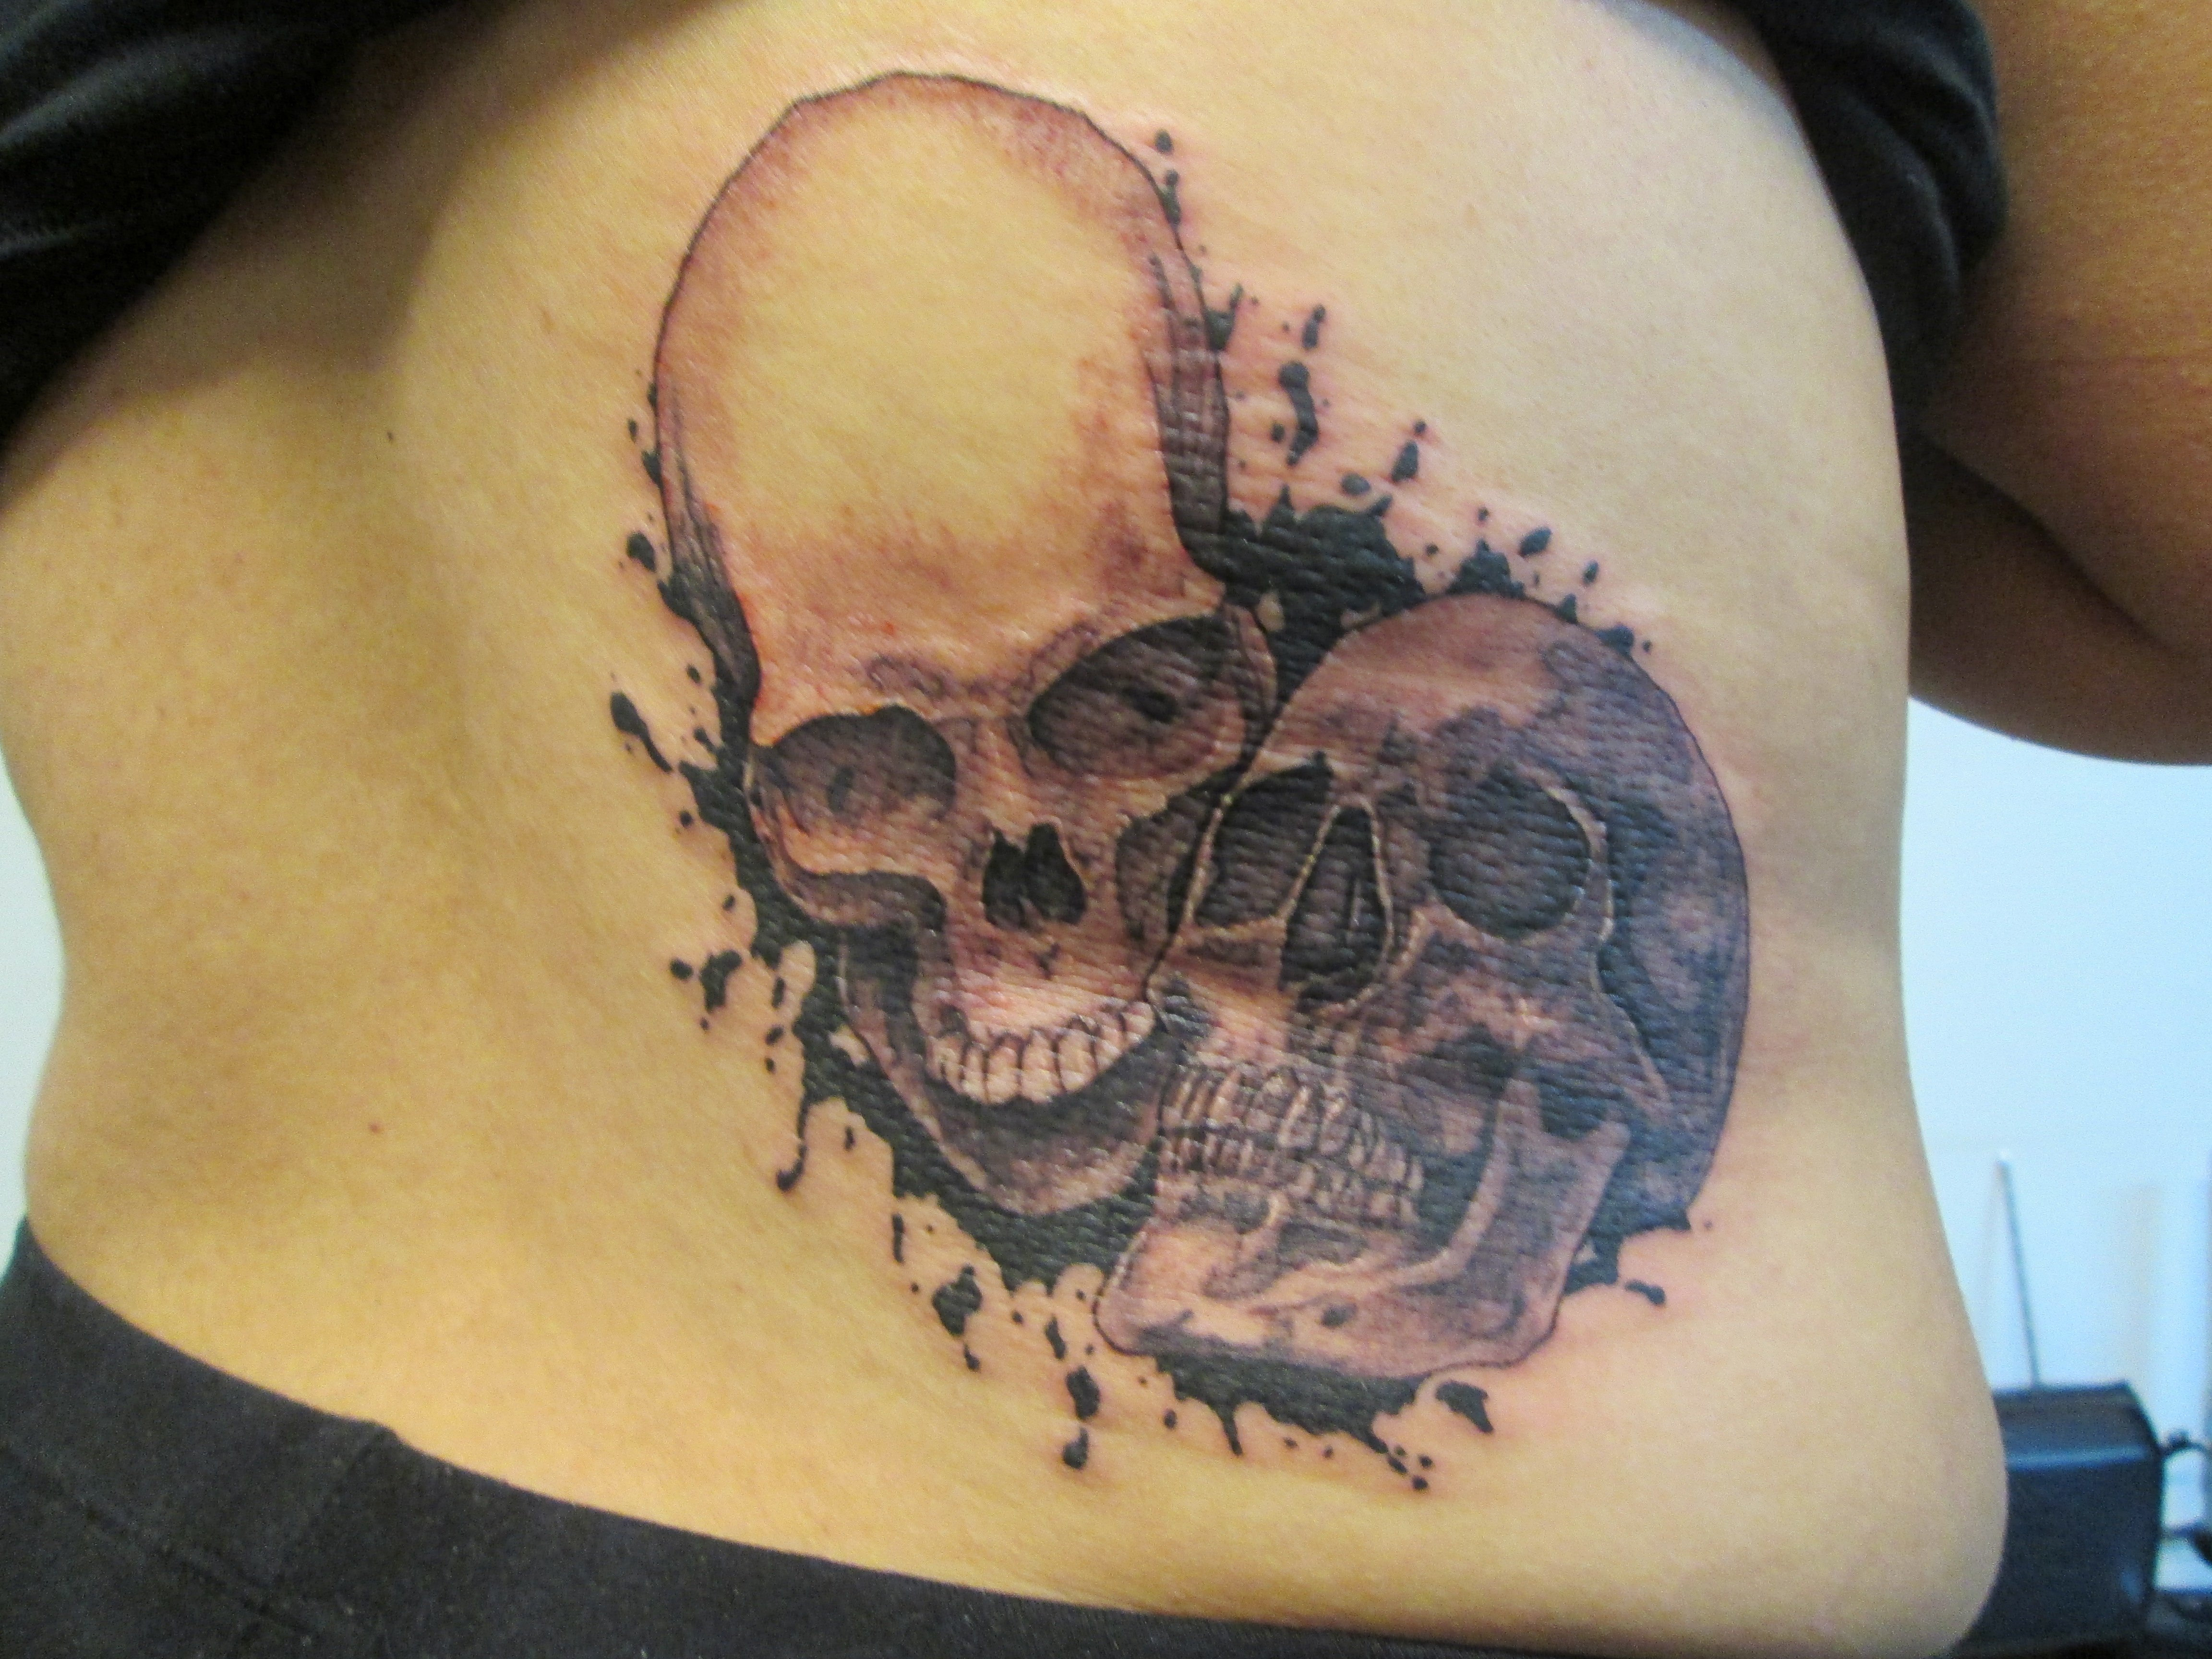 Rob Wilkinson's Tattoo Work